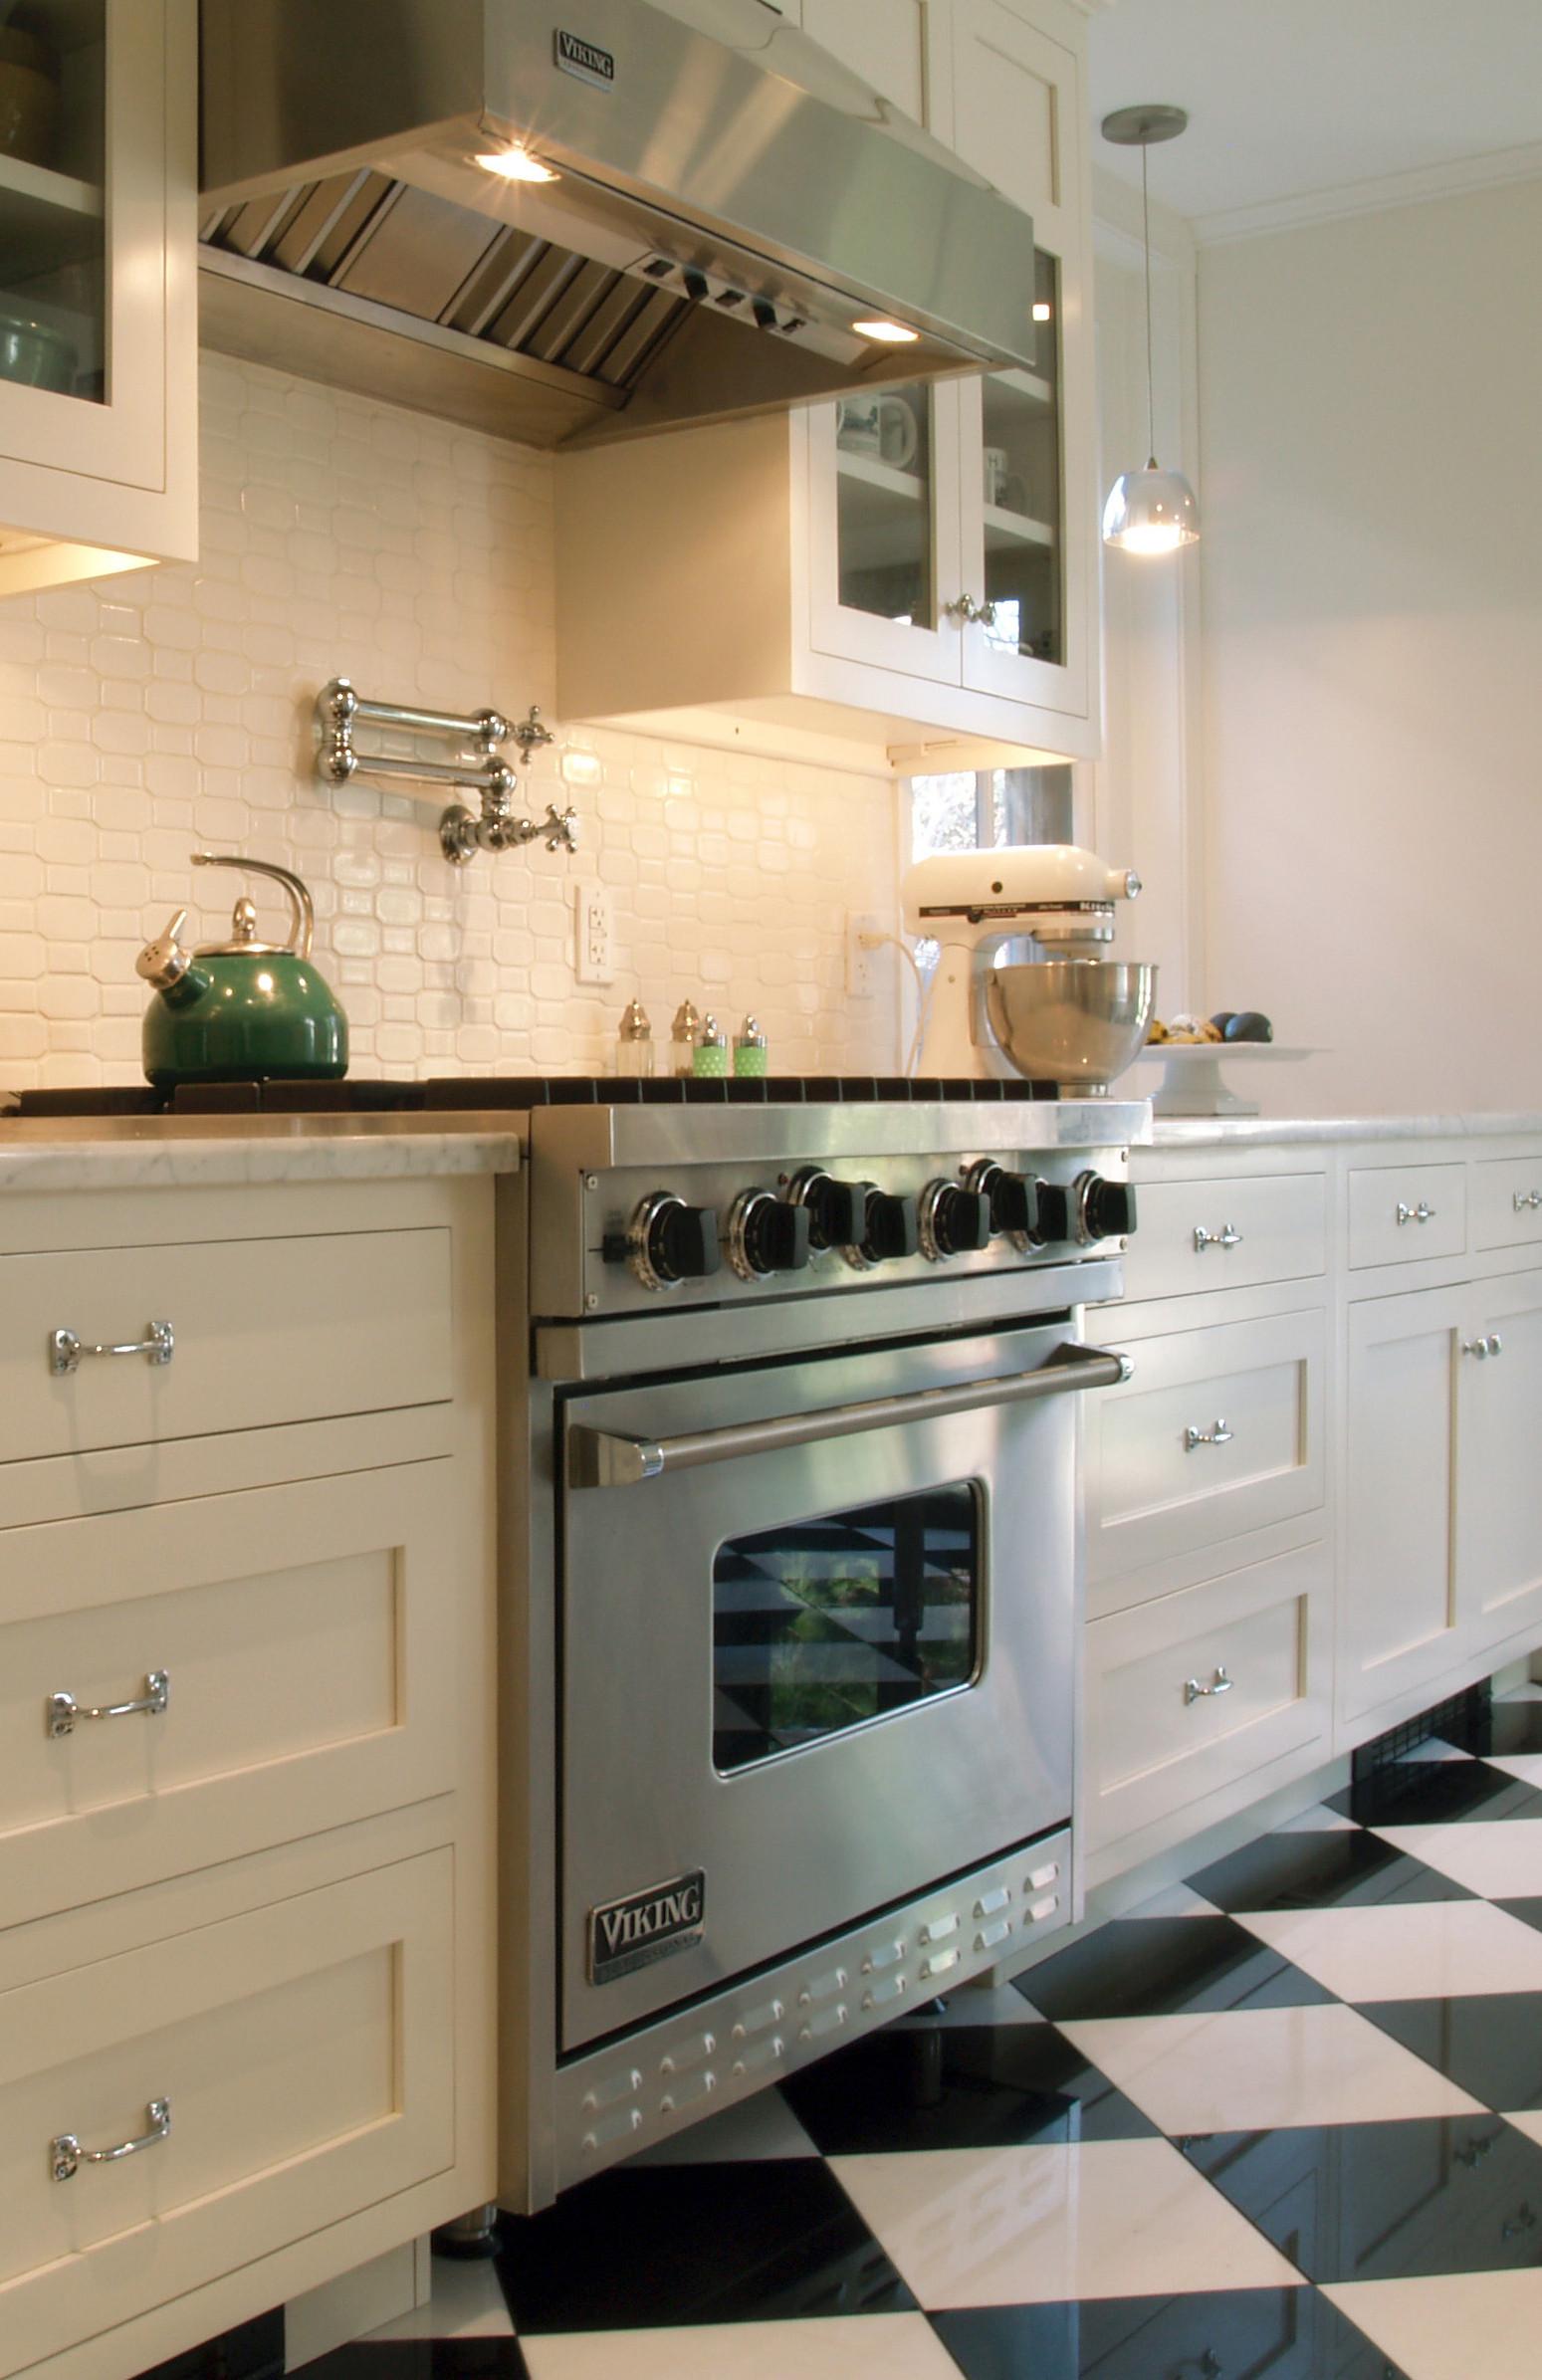 White Tile Kitchen Backsplash  Spice Up Your Kitchen Tile Backsplash Ideas